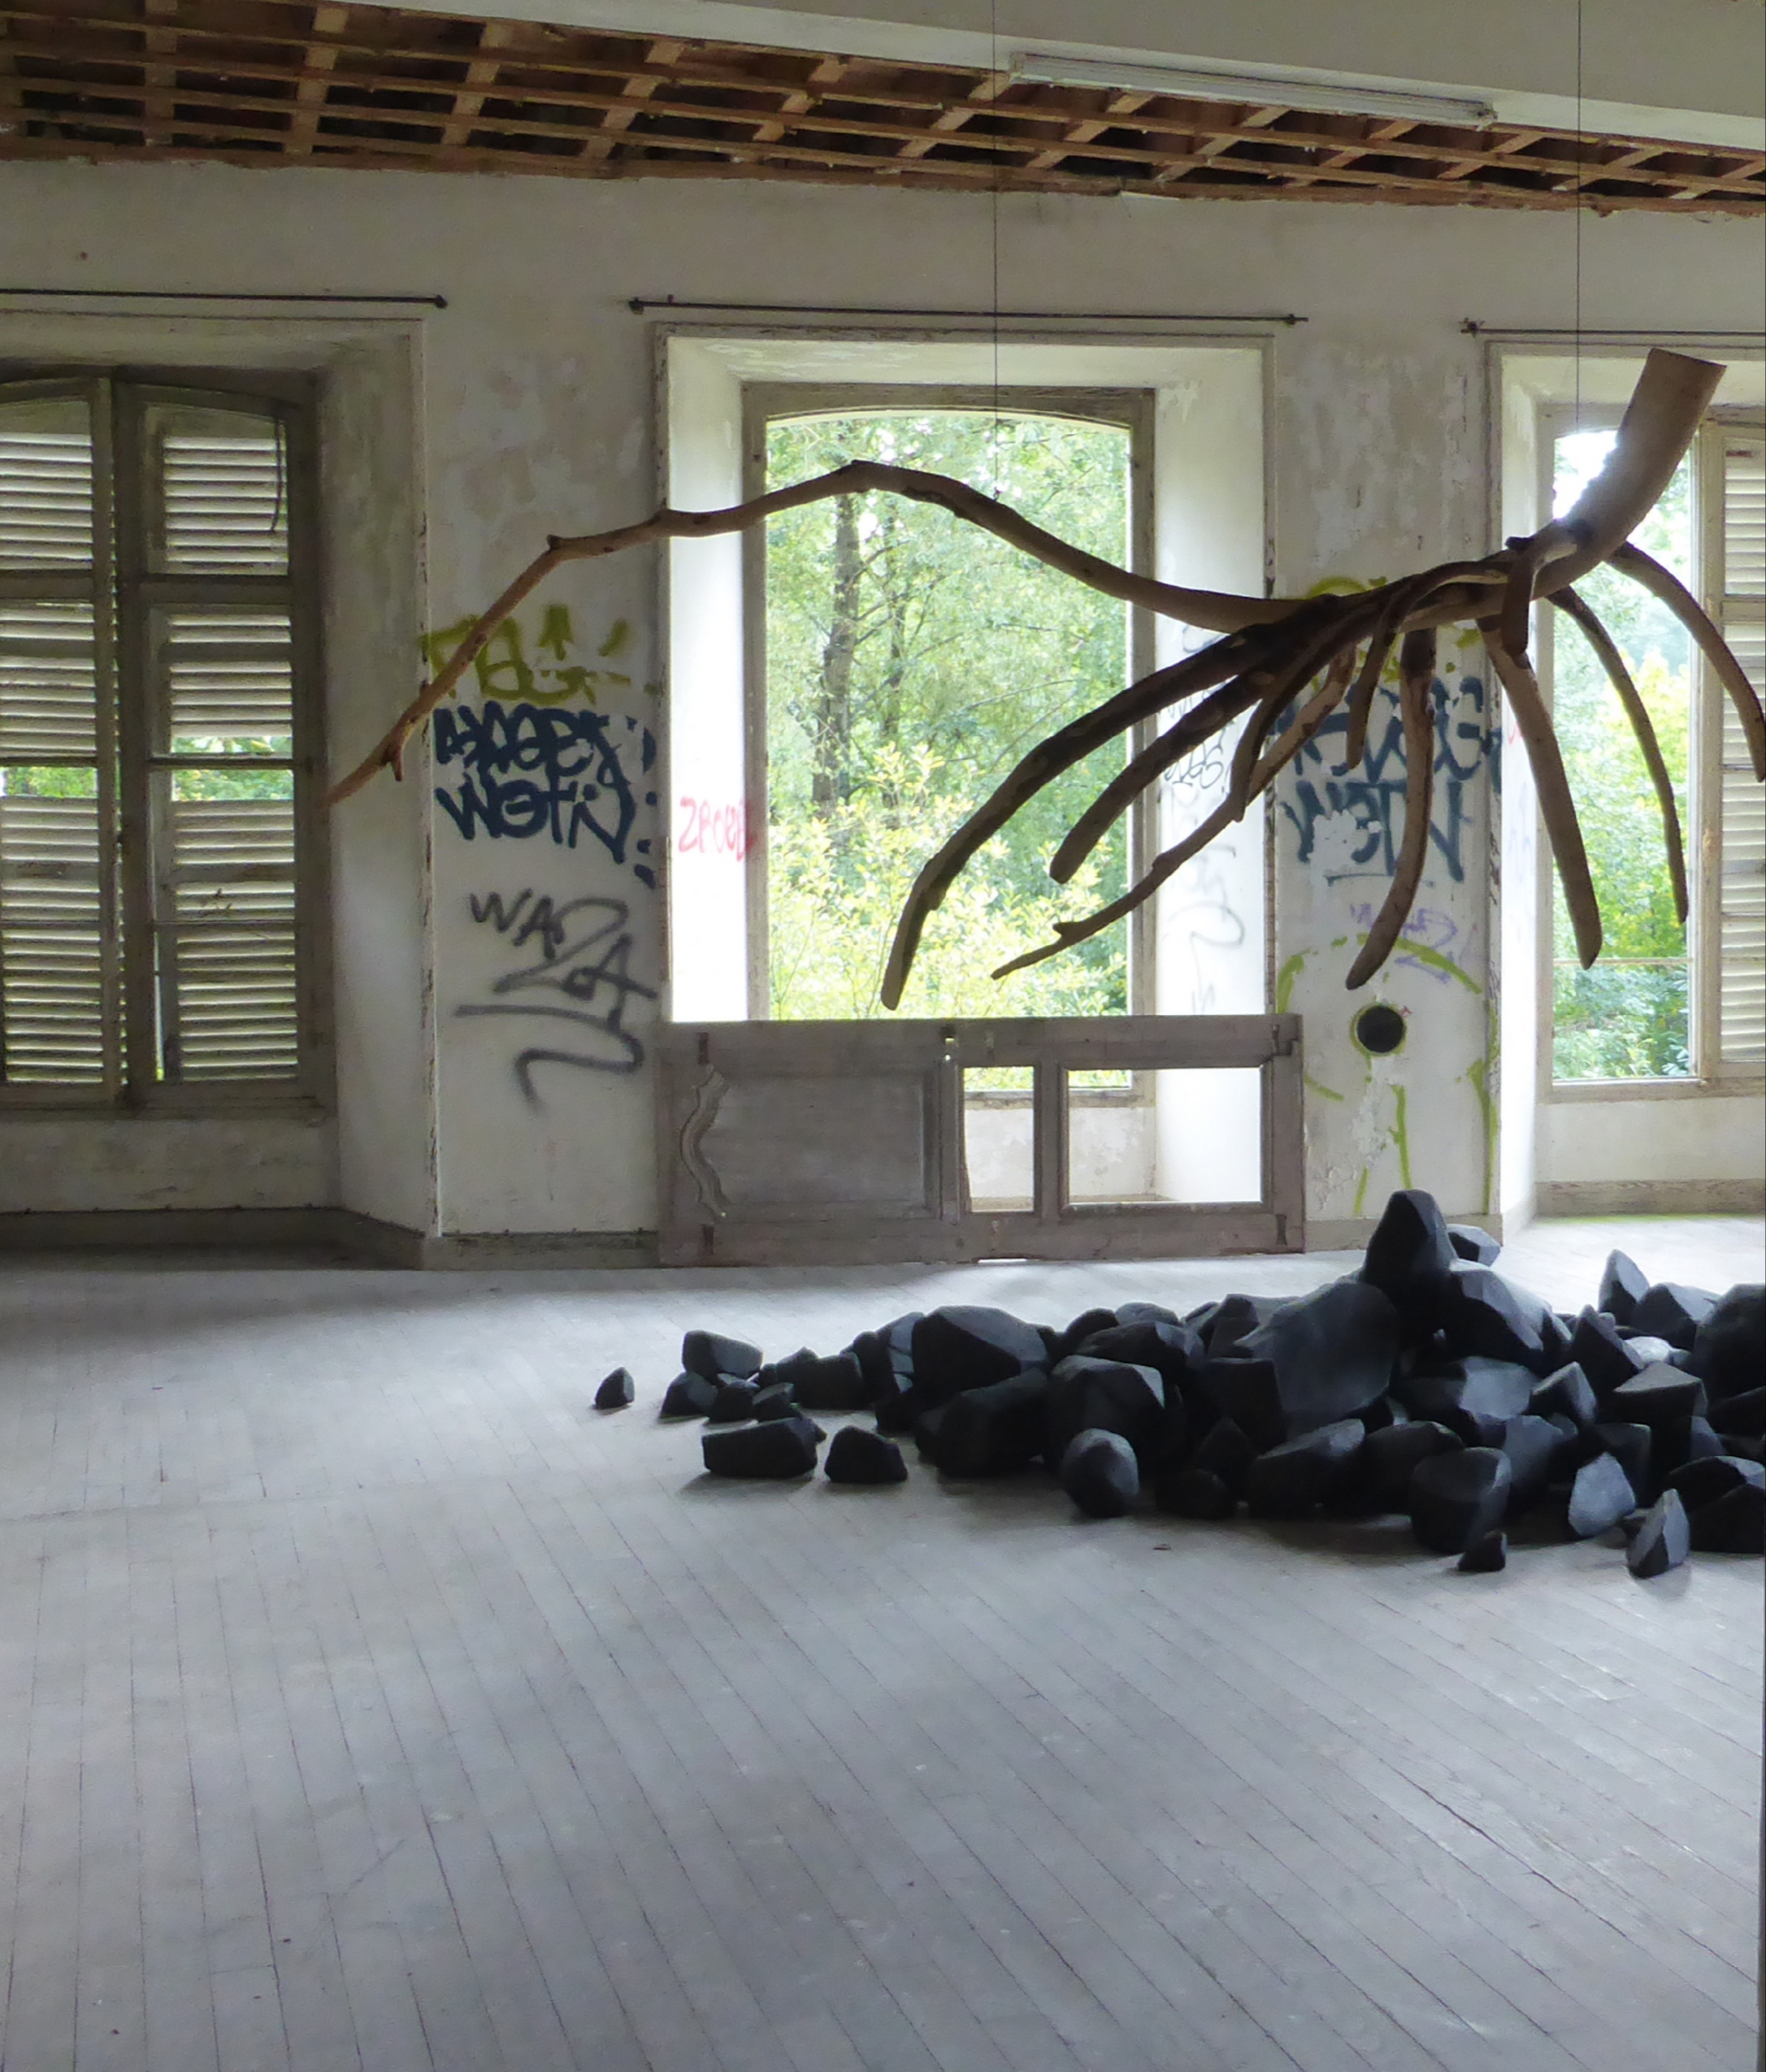 GARDEN PARTY URBEX installation Lelia Demoisy 4 credit Jean Paul Matifat 2020